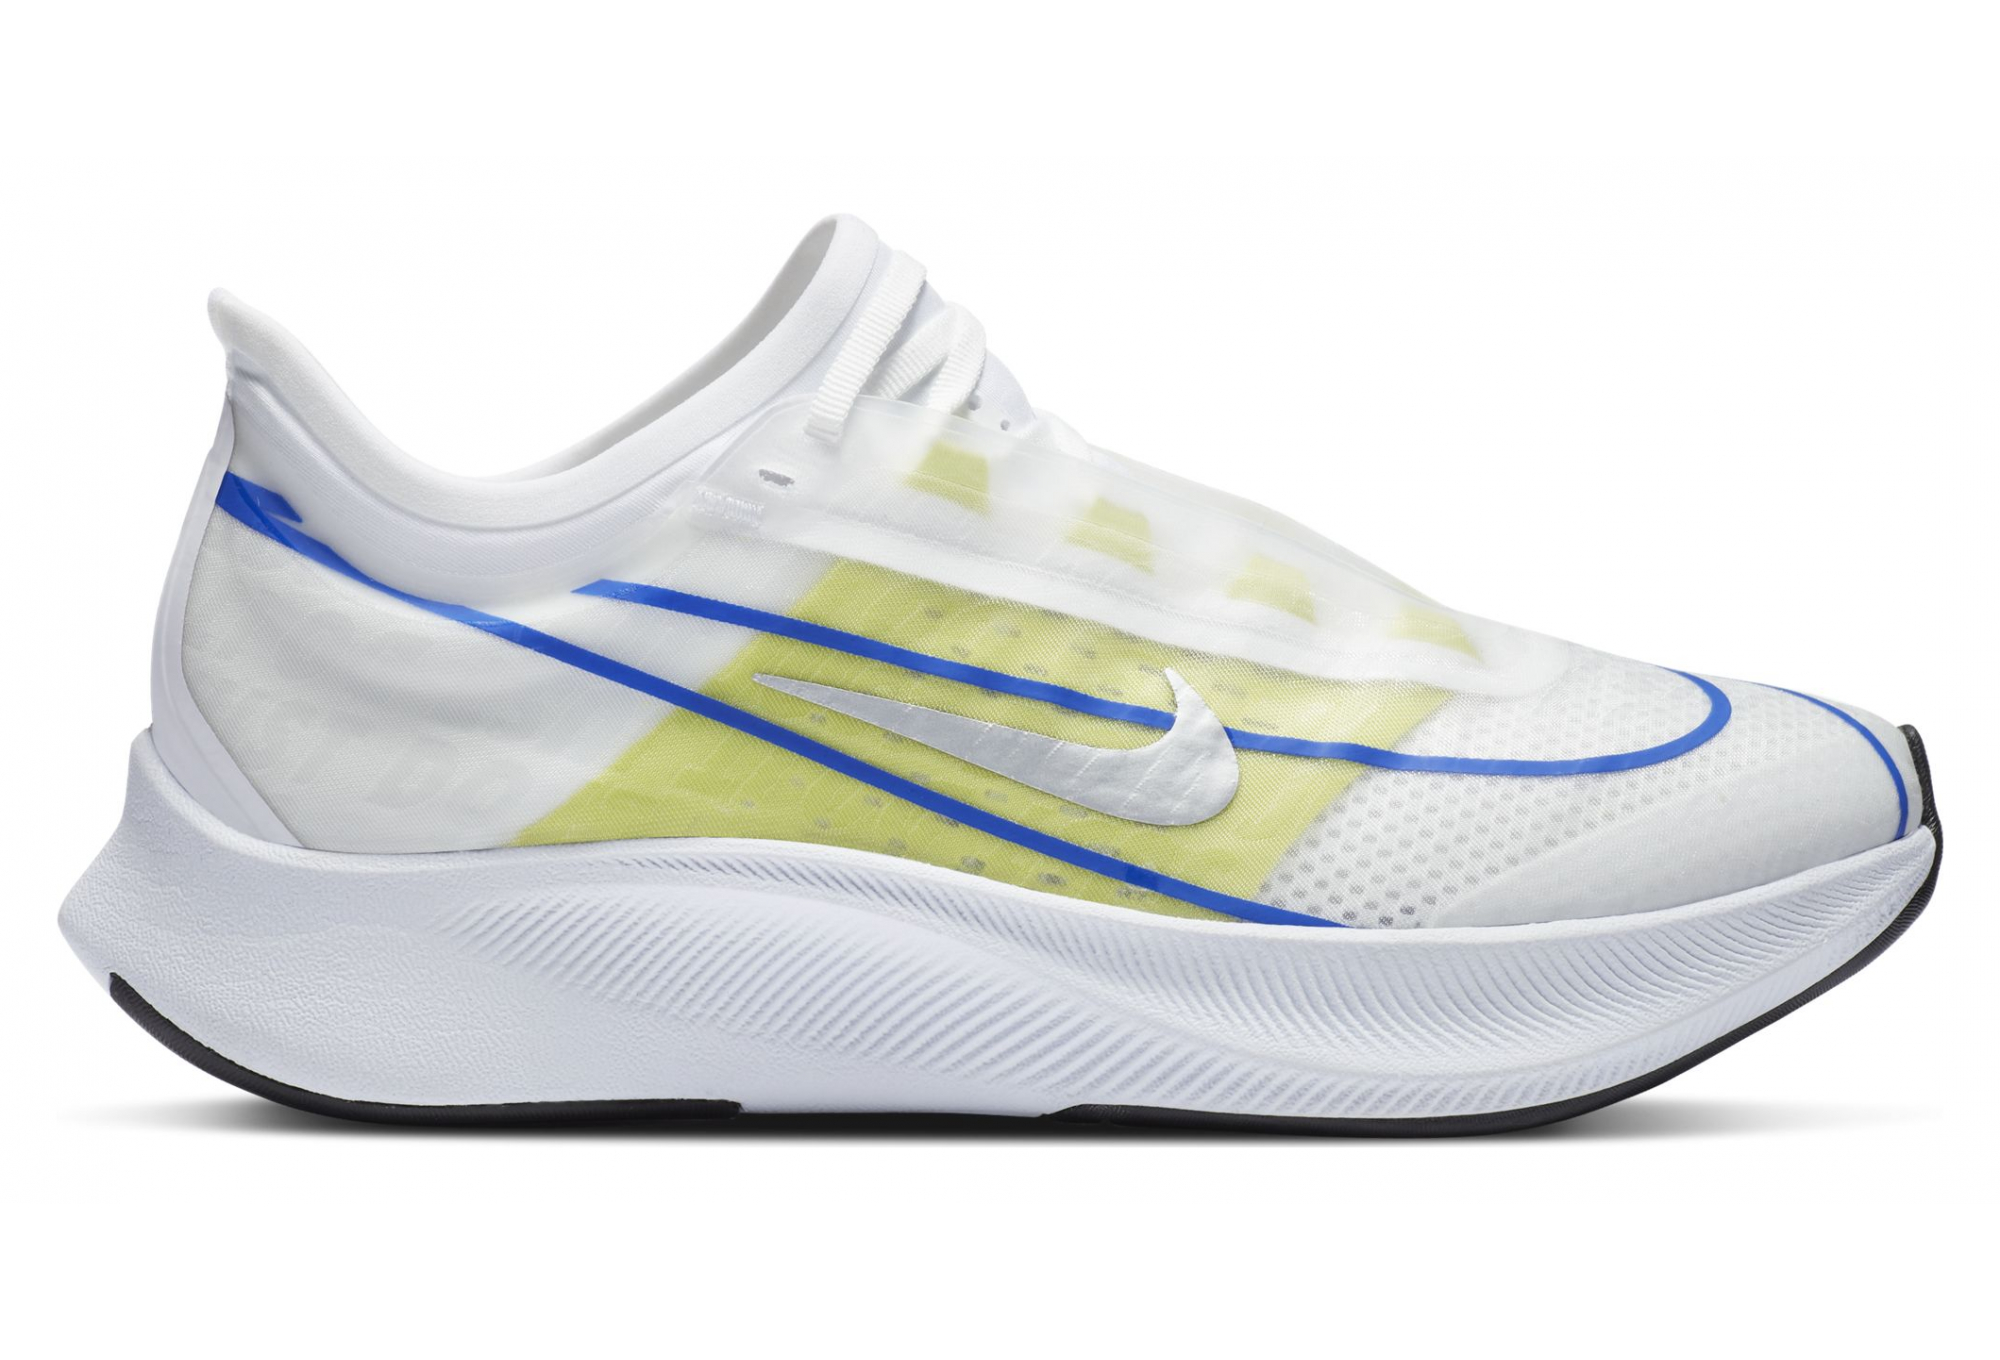 Nike Zoom Fly 3 Ekiden Running Shoes White Yellow Blue Women ...